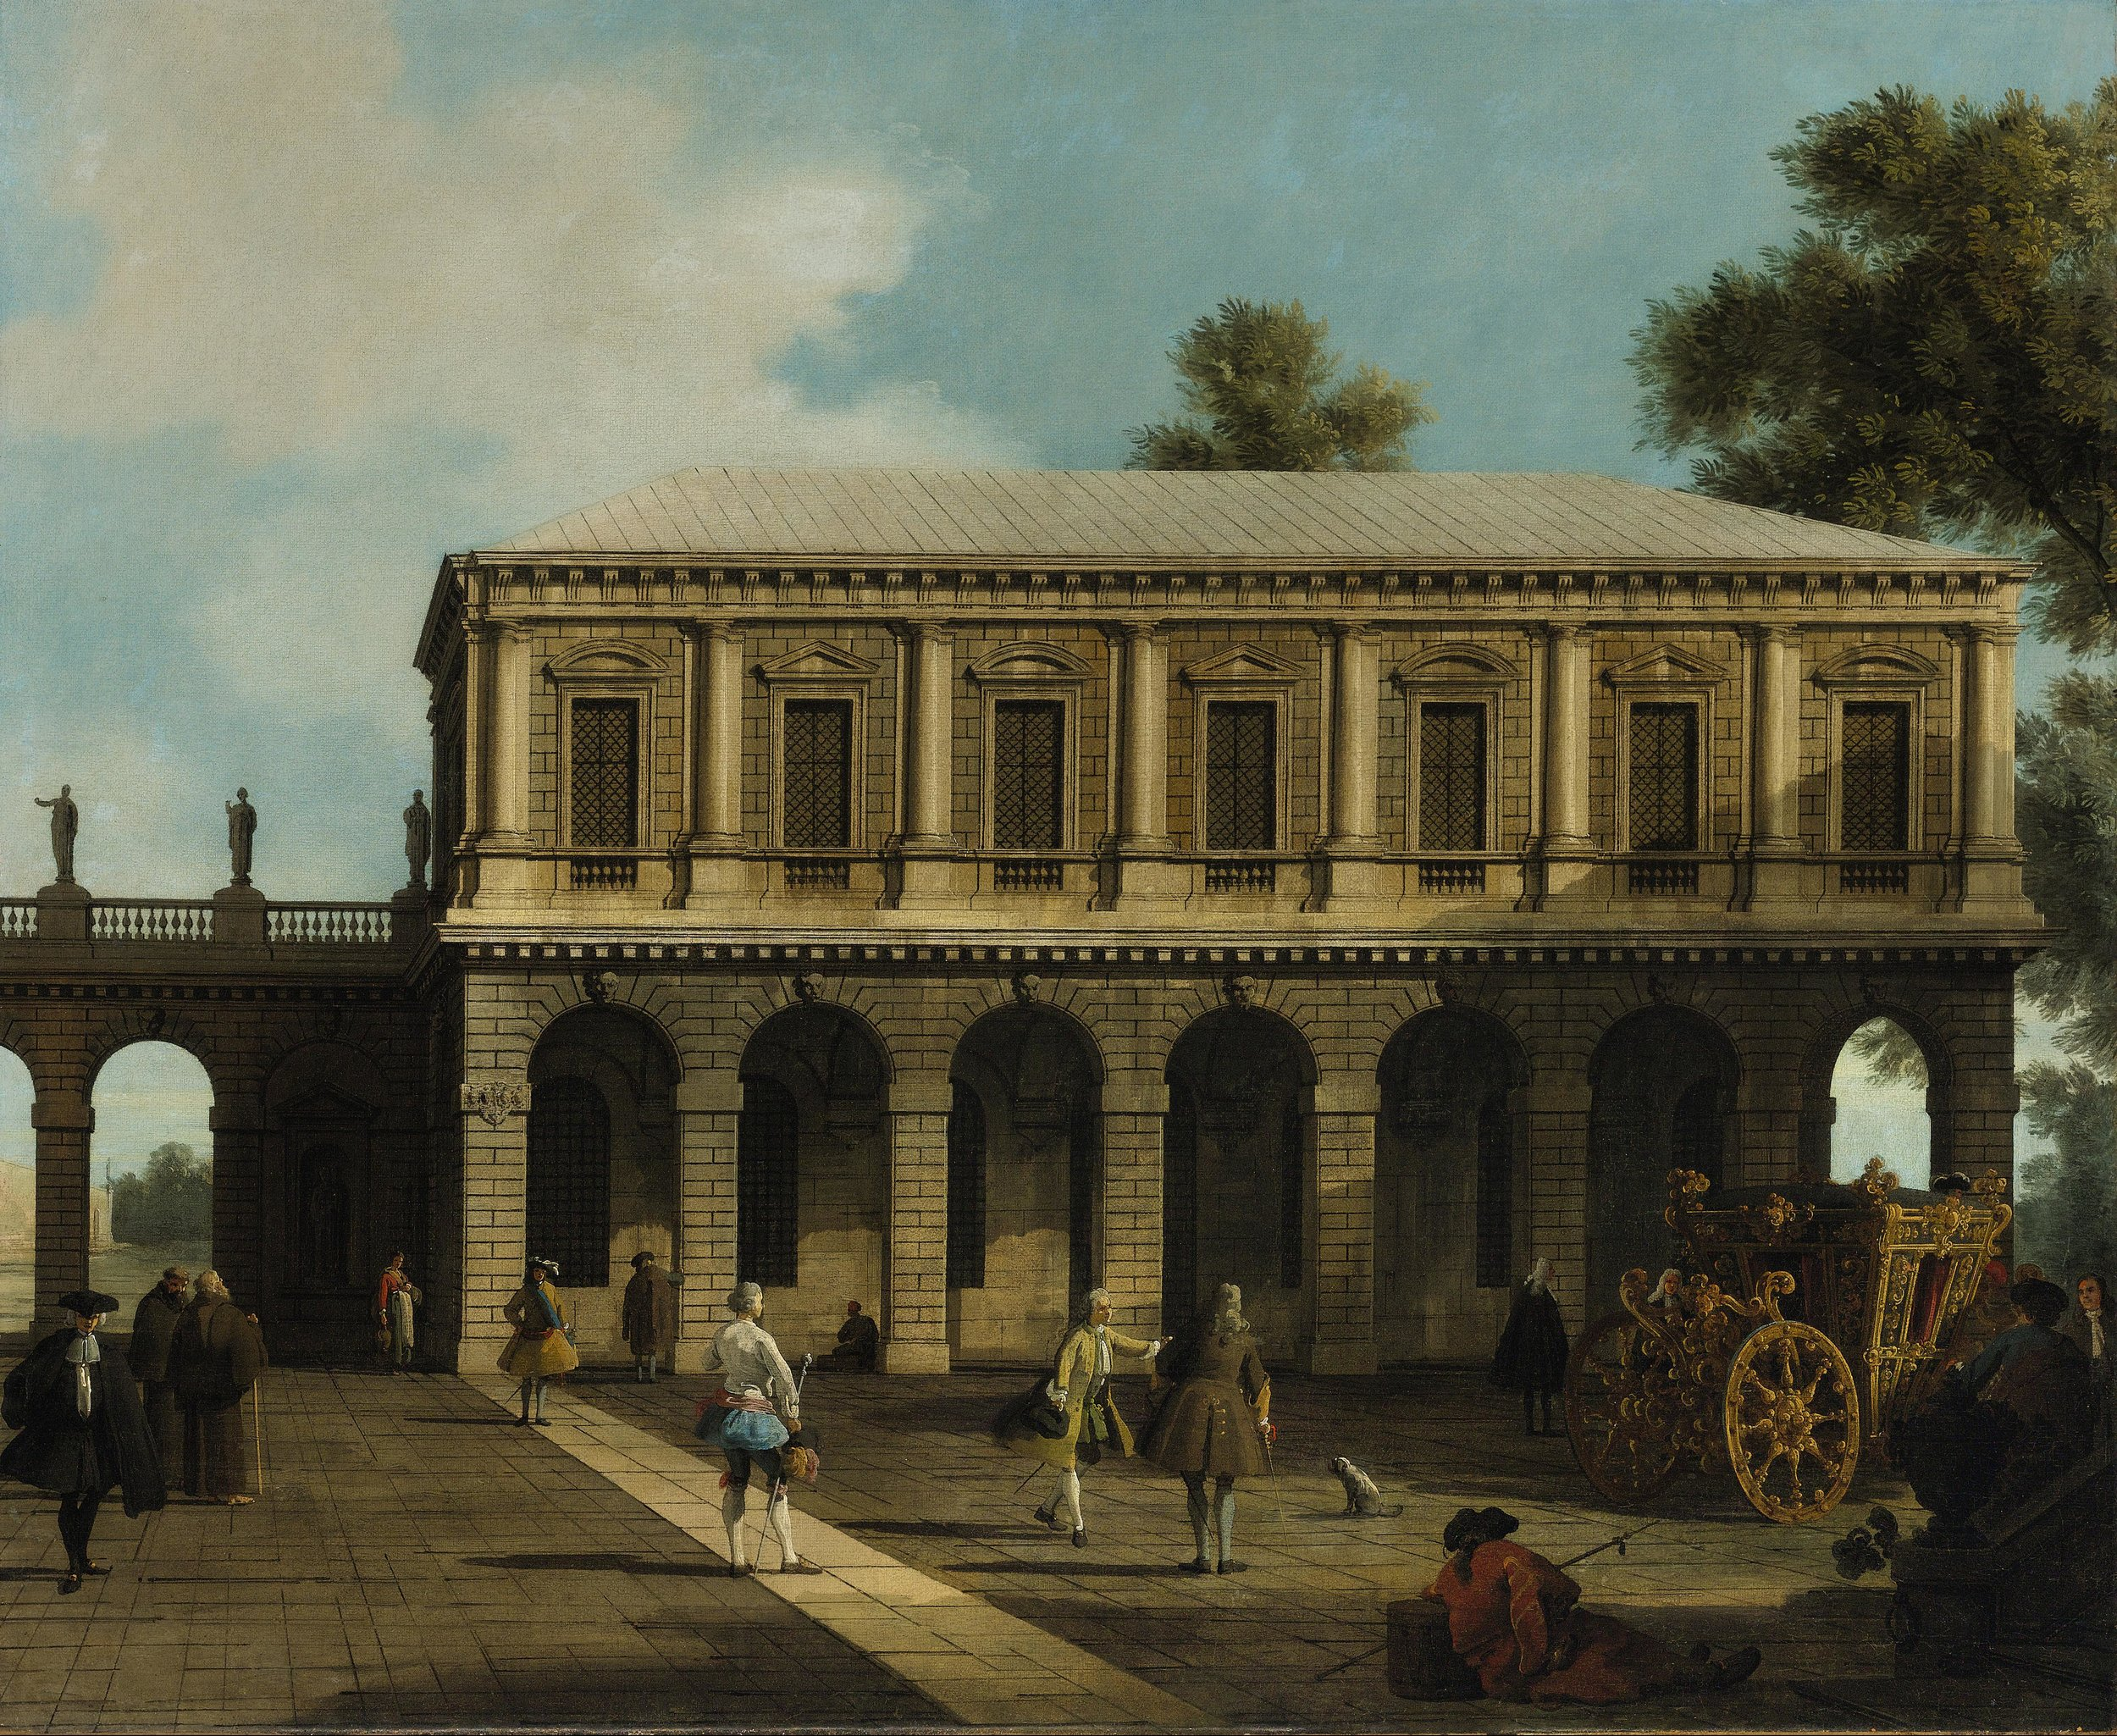 GIOVANNI ANTONIO CANAL, called CANALETTO     (Venice, 1697 – 1768) A Capriccio of the Prisons of San Marco Oil on canvas, 105.5 x 127.5 cm